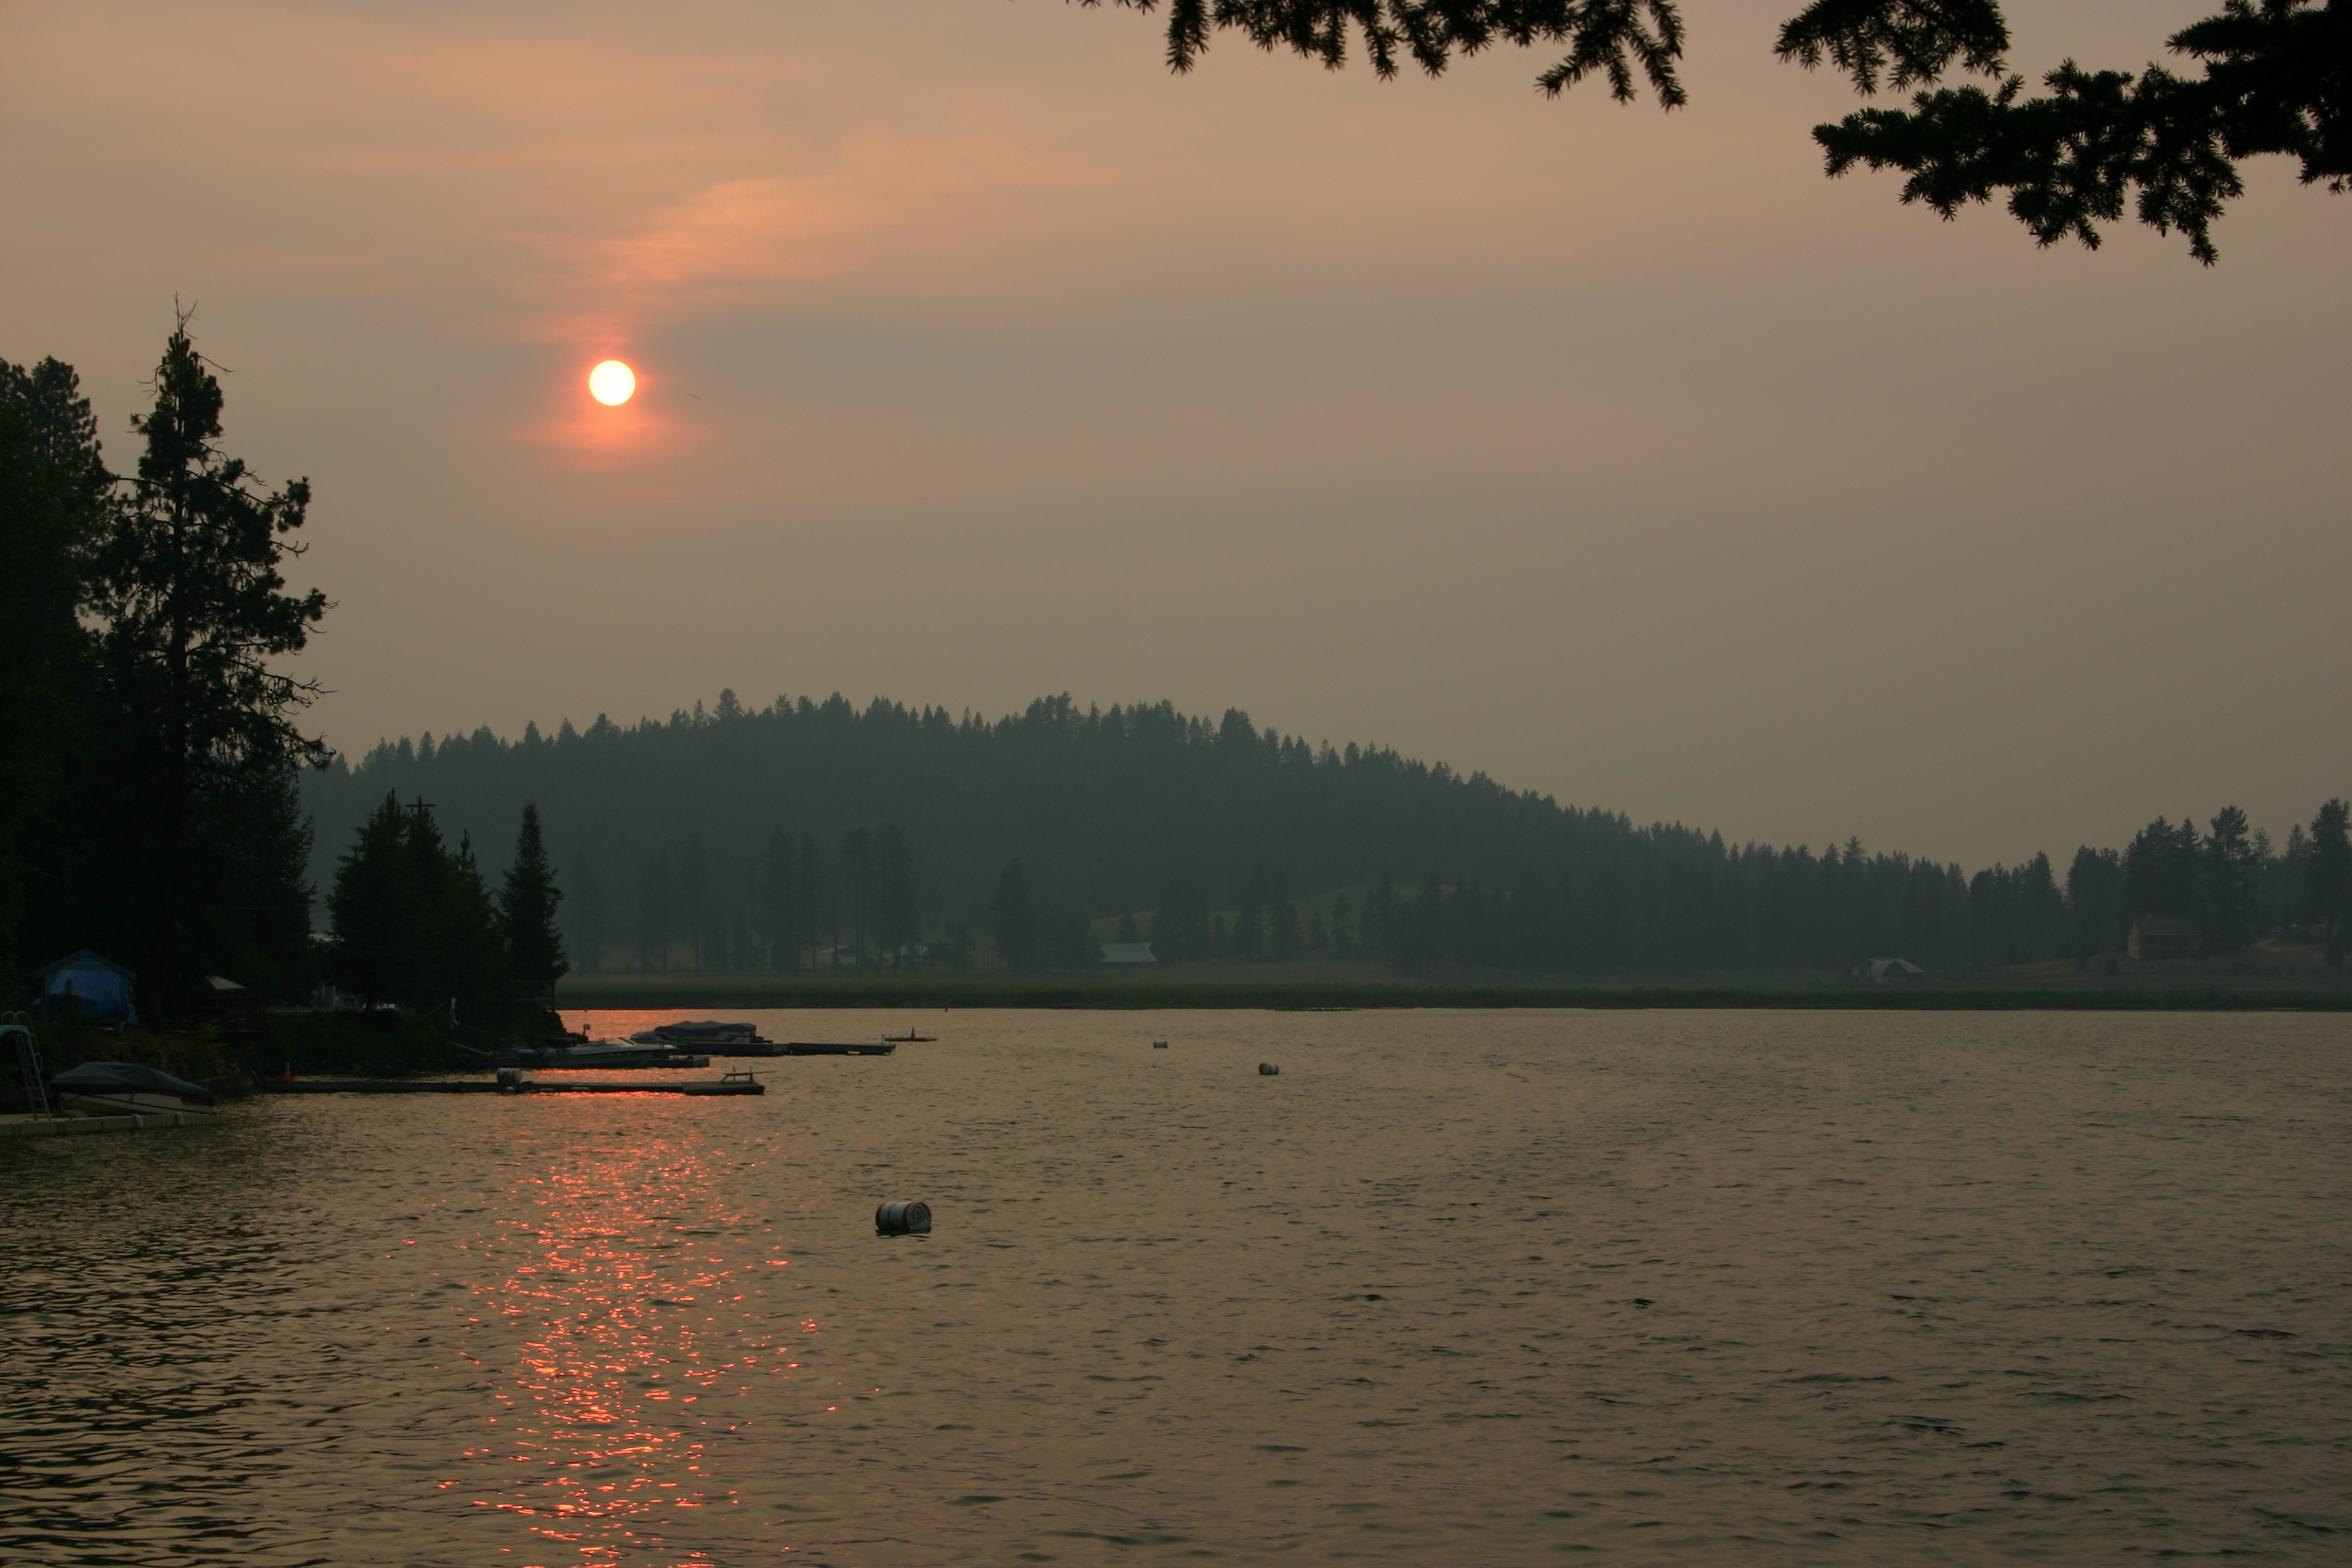 Lake side photo